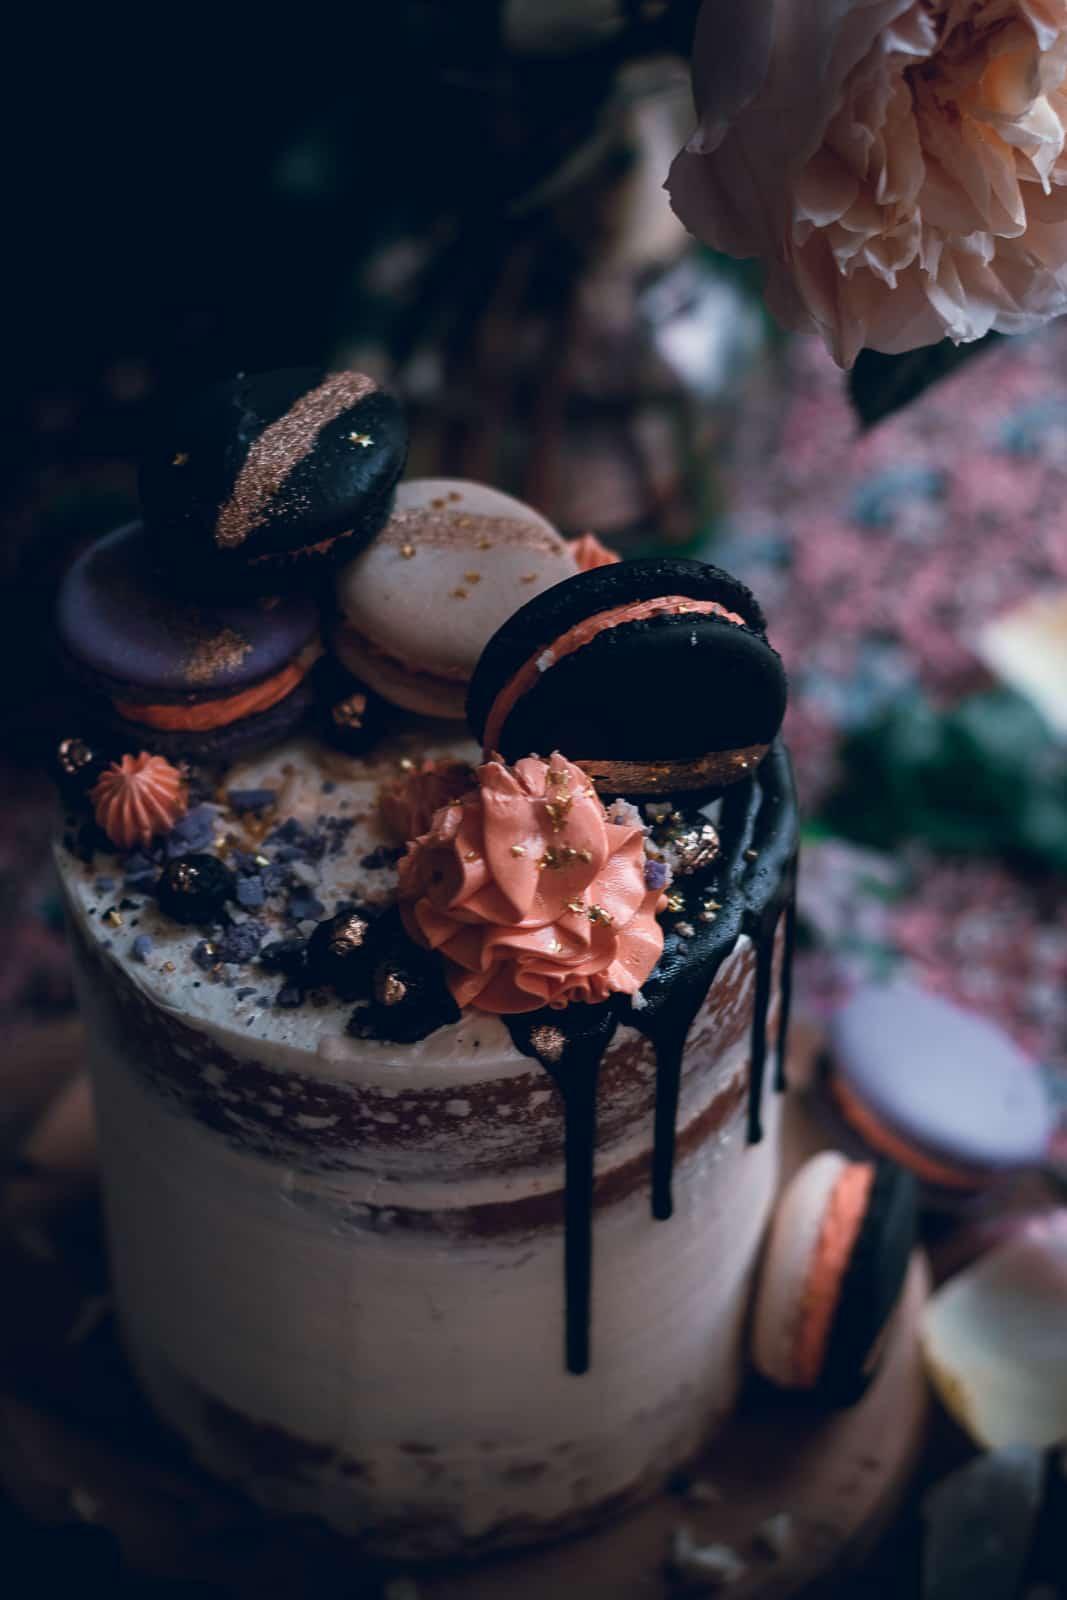 rose_garden_cake-3748